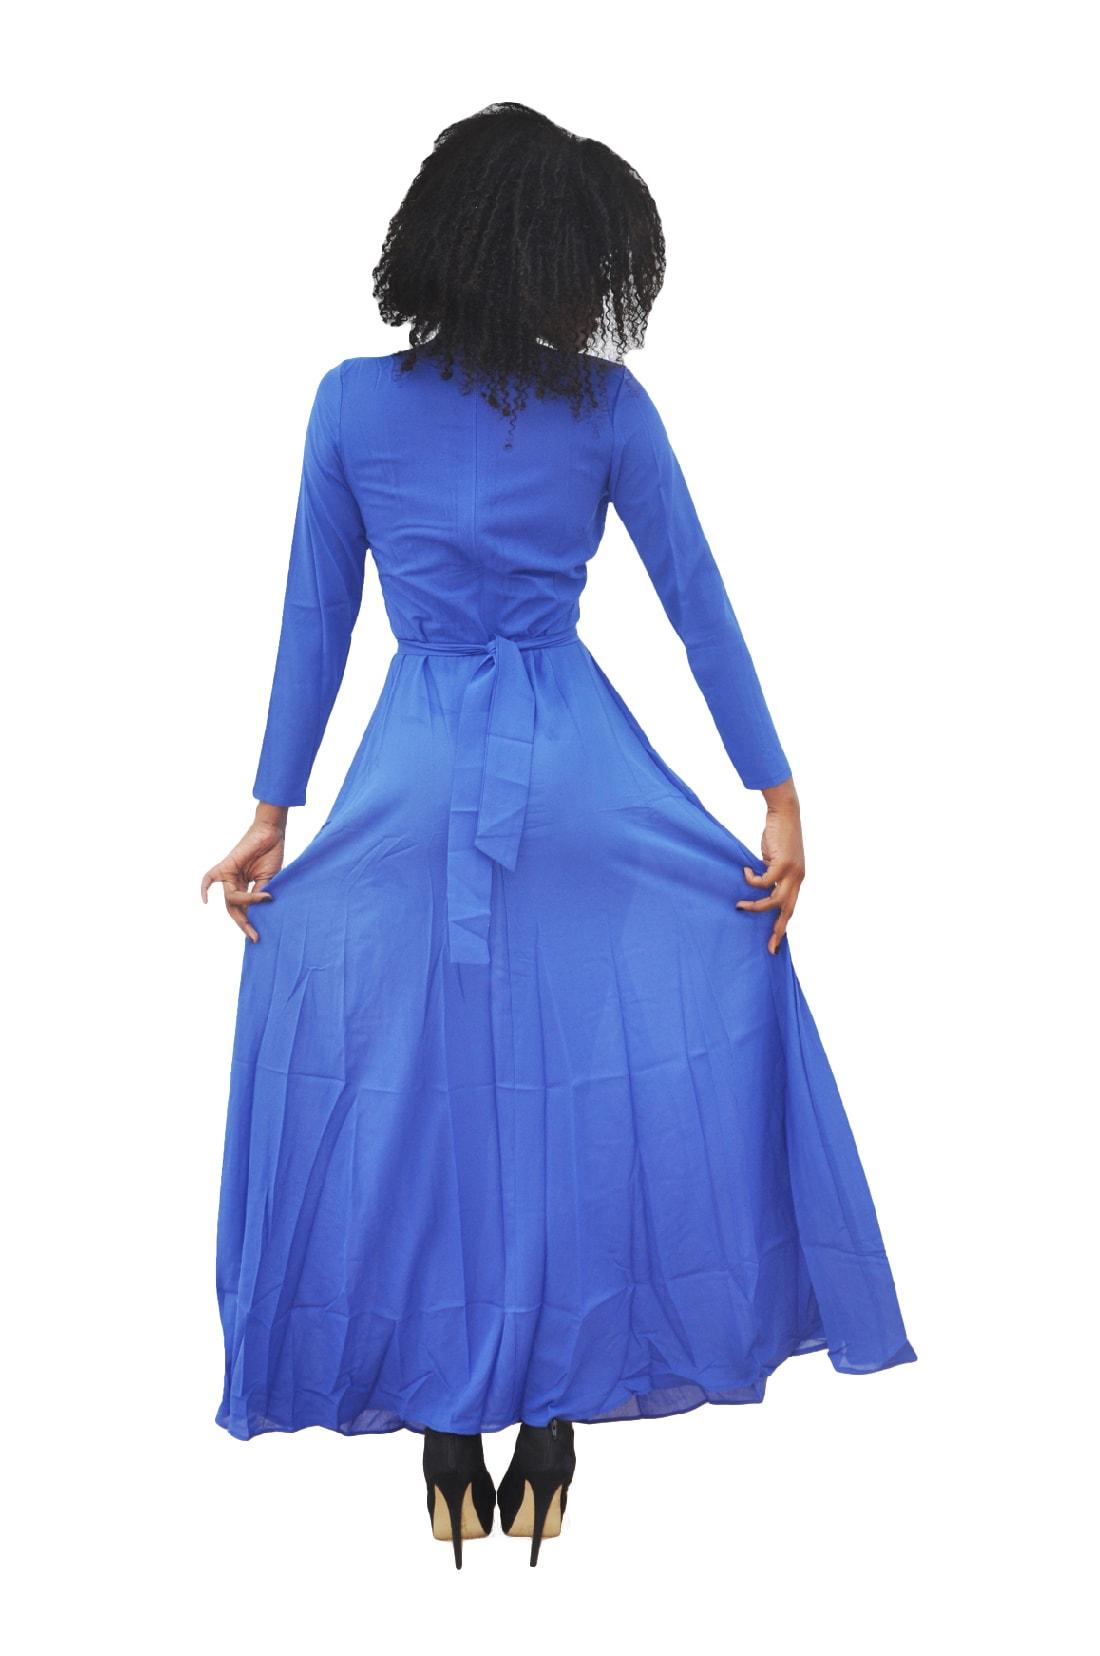 M0293 blue3 Long Sleeve Dresses maureens.com boutique